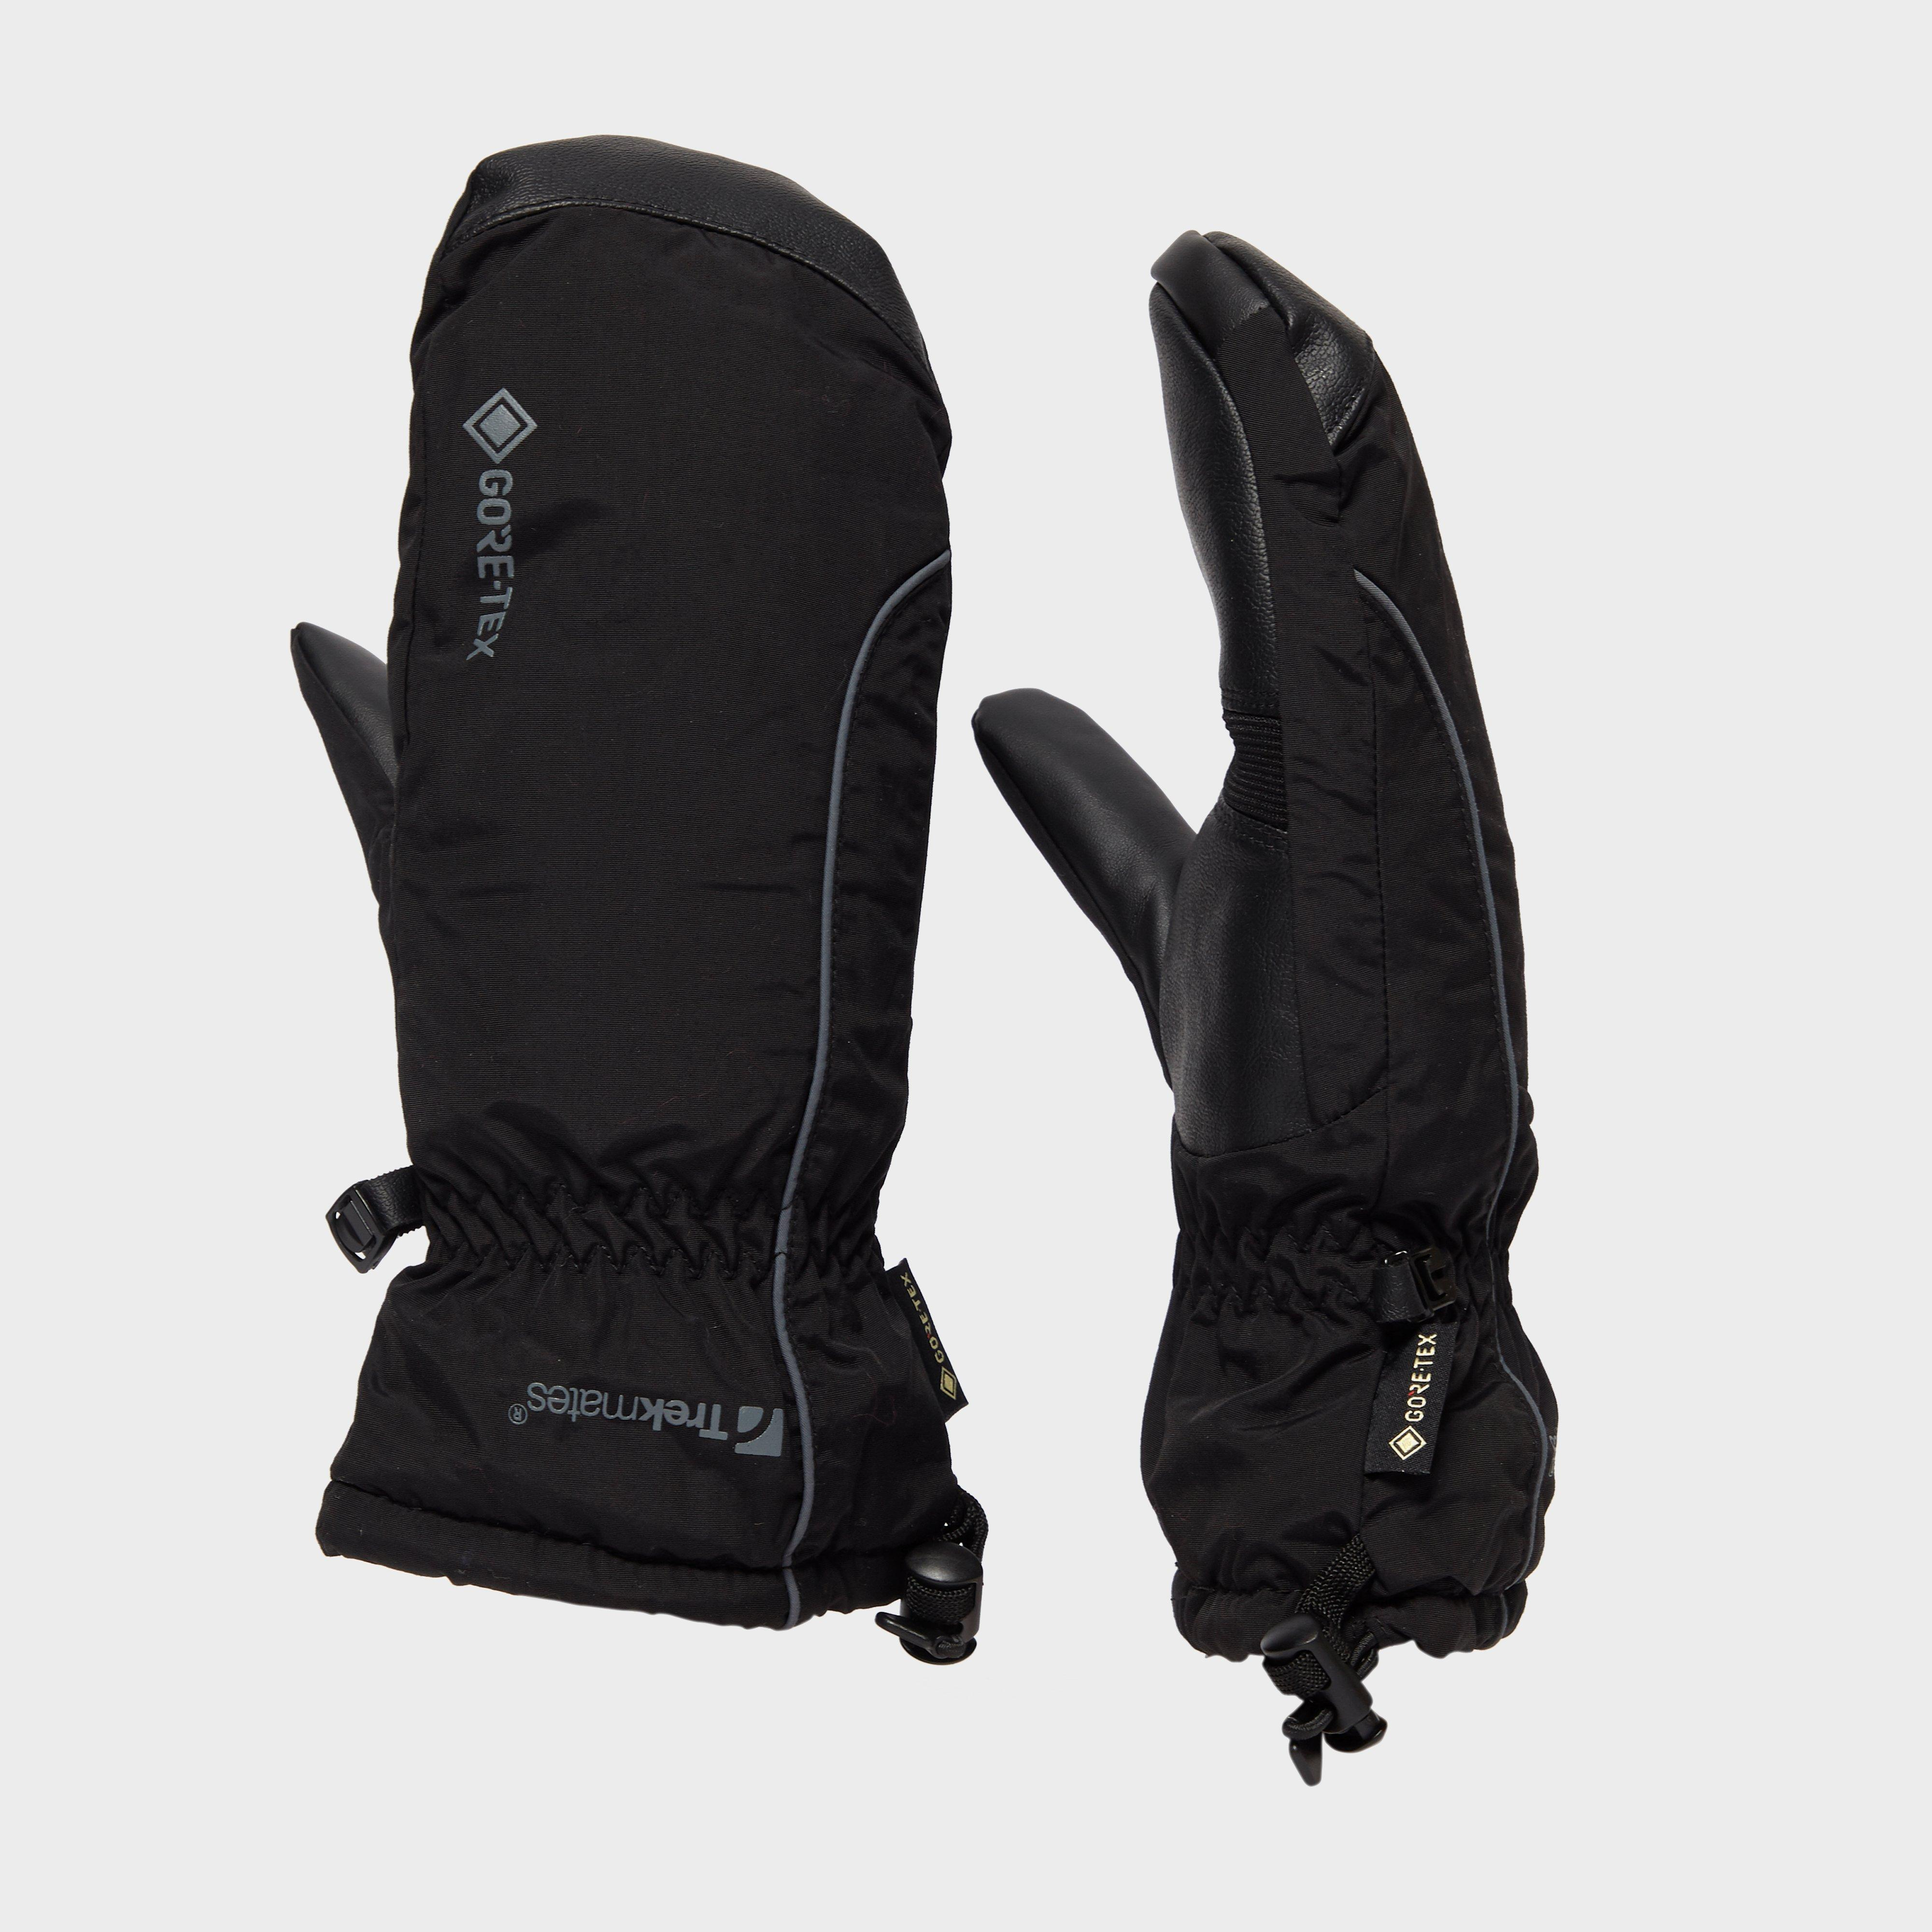 Trekmates Trekmates GORE-TEX Chamonix Mitts - Black, Black